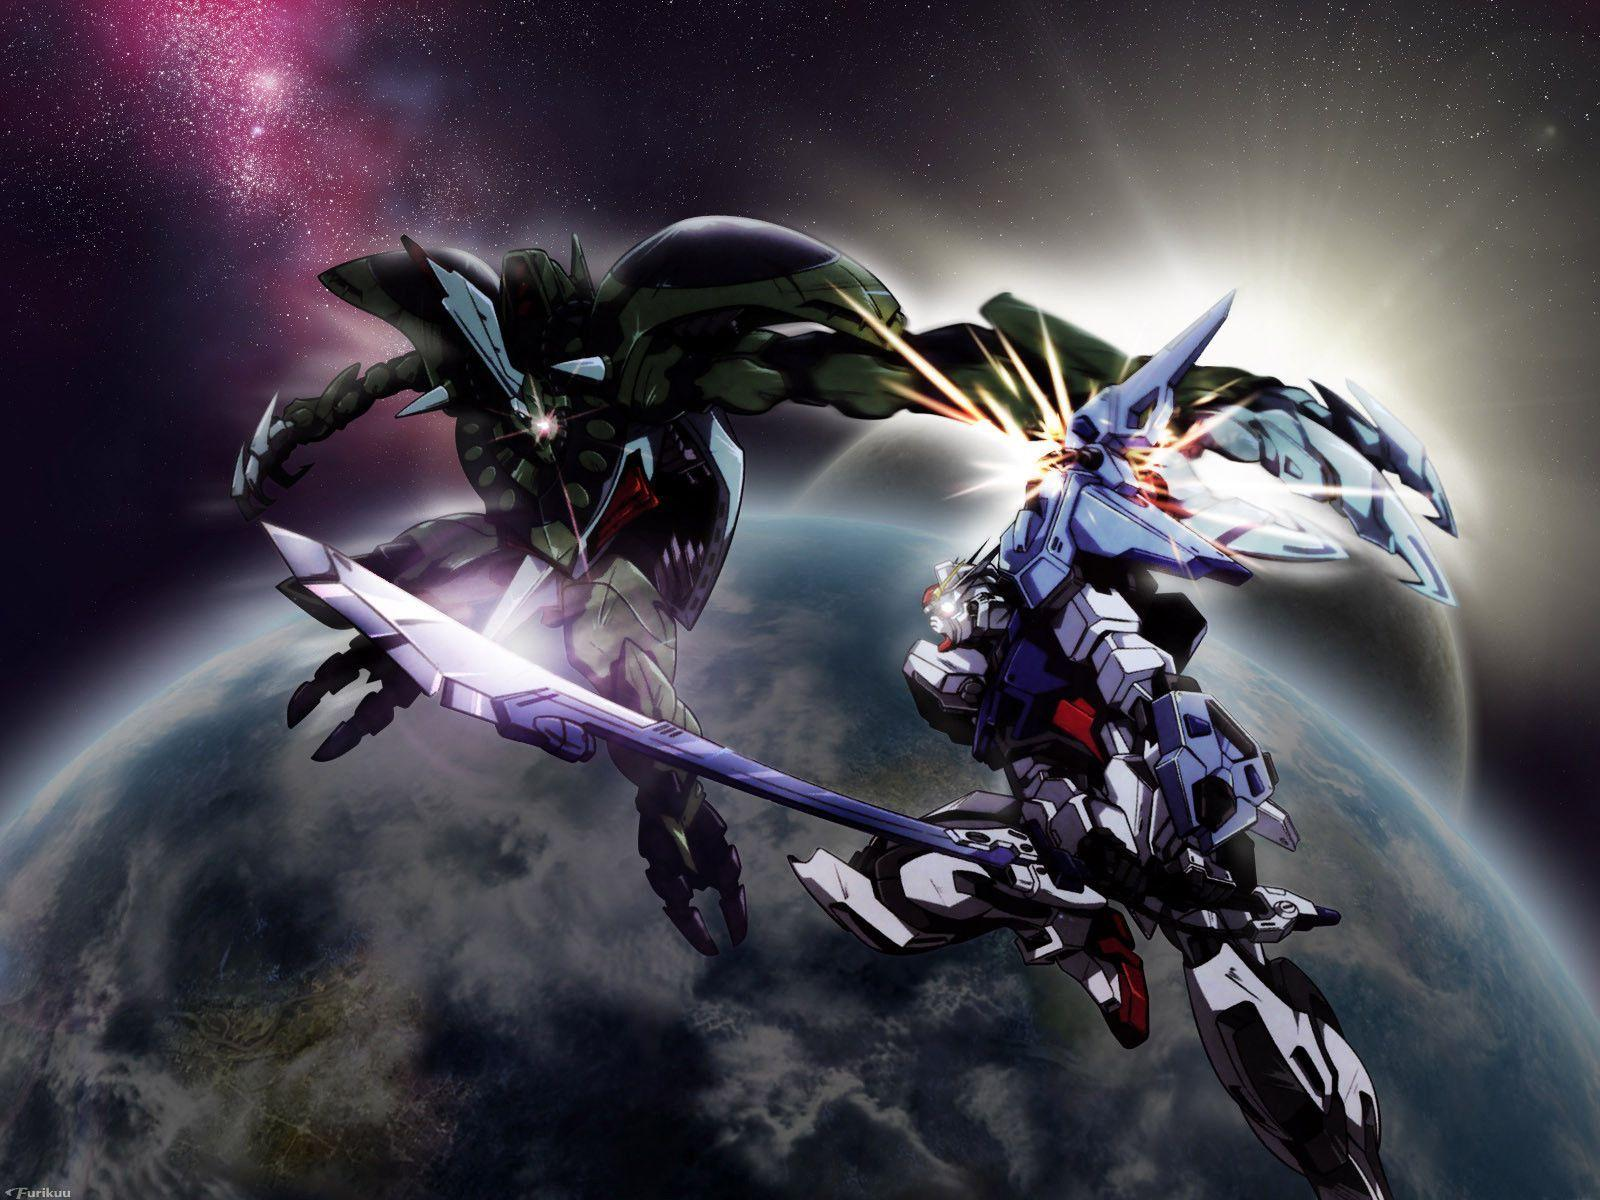 Hd Gundam Themes: Gundam Unicorn Wallpapers